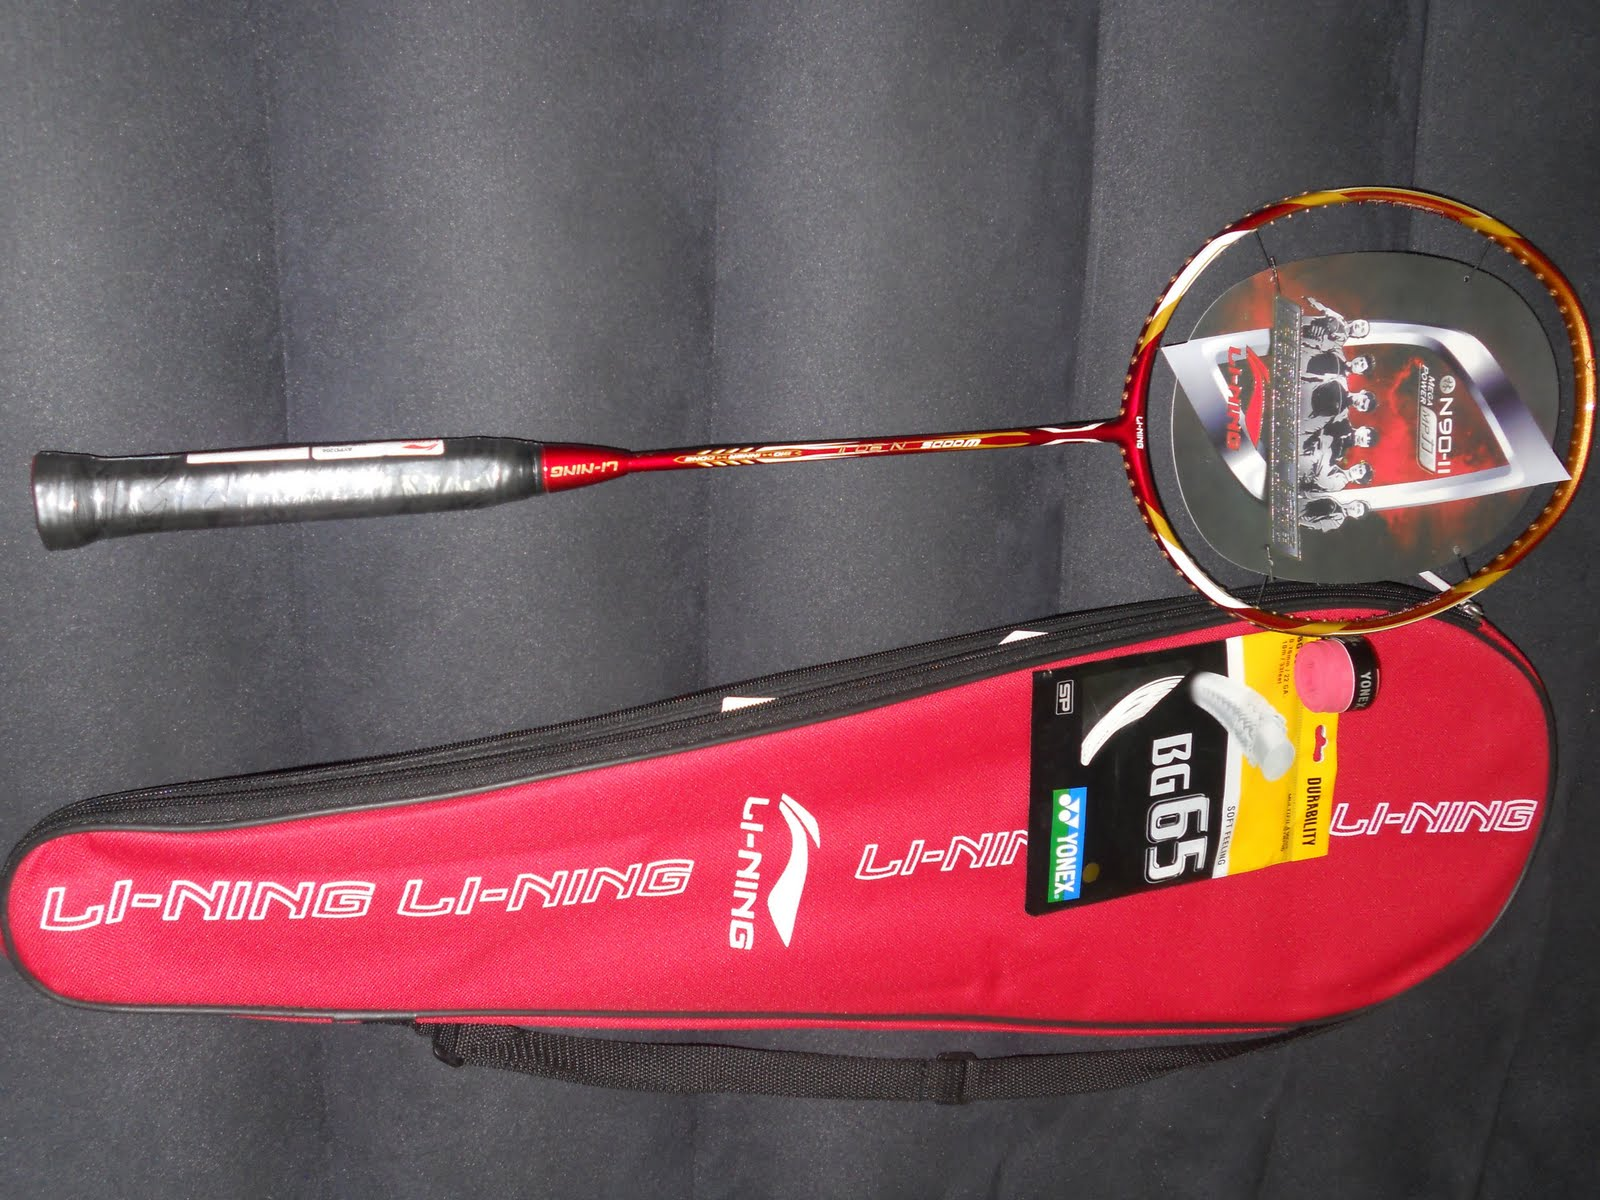 Online Raket Badminton Yonex Li Ning August 2011